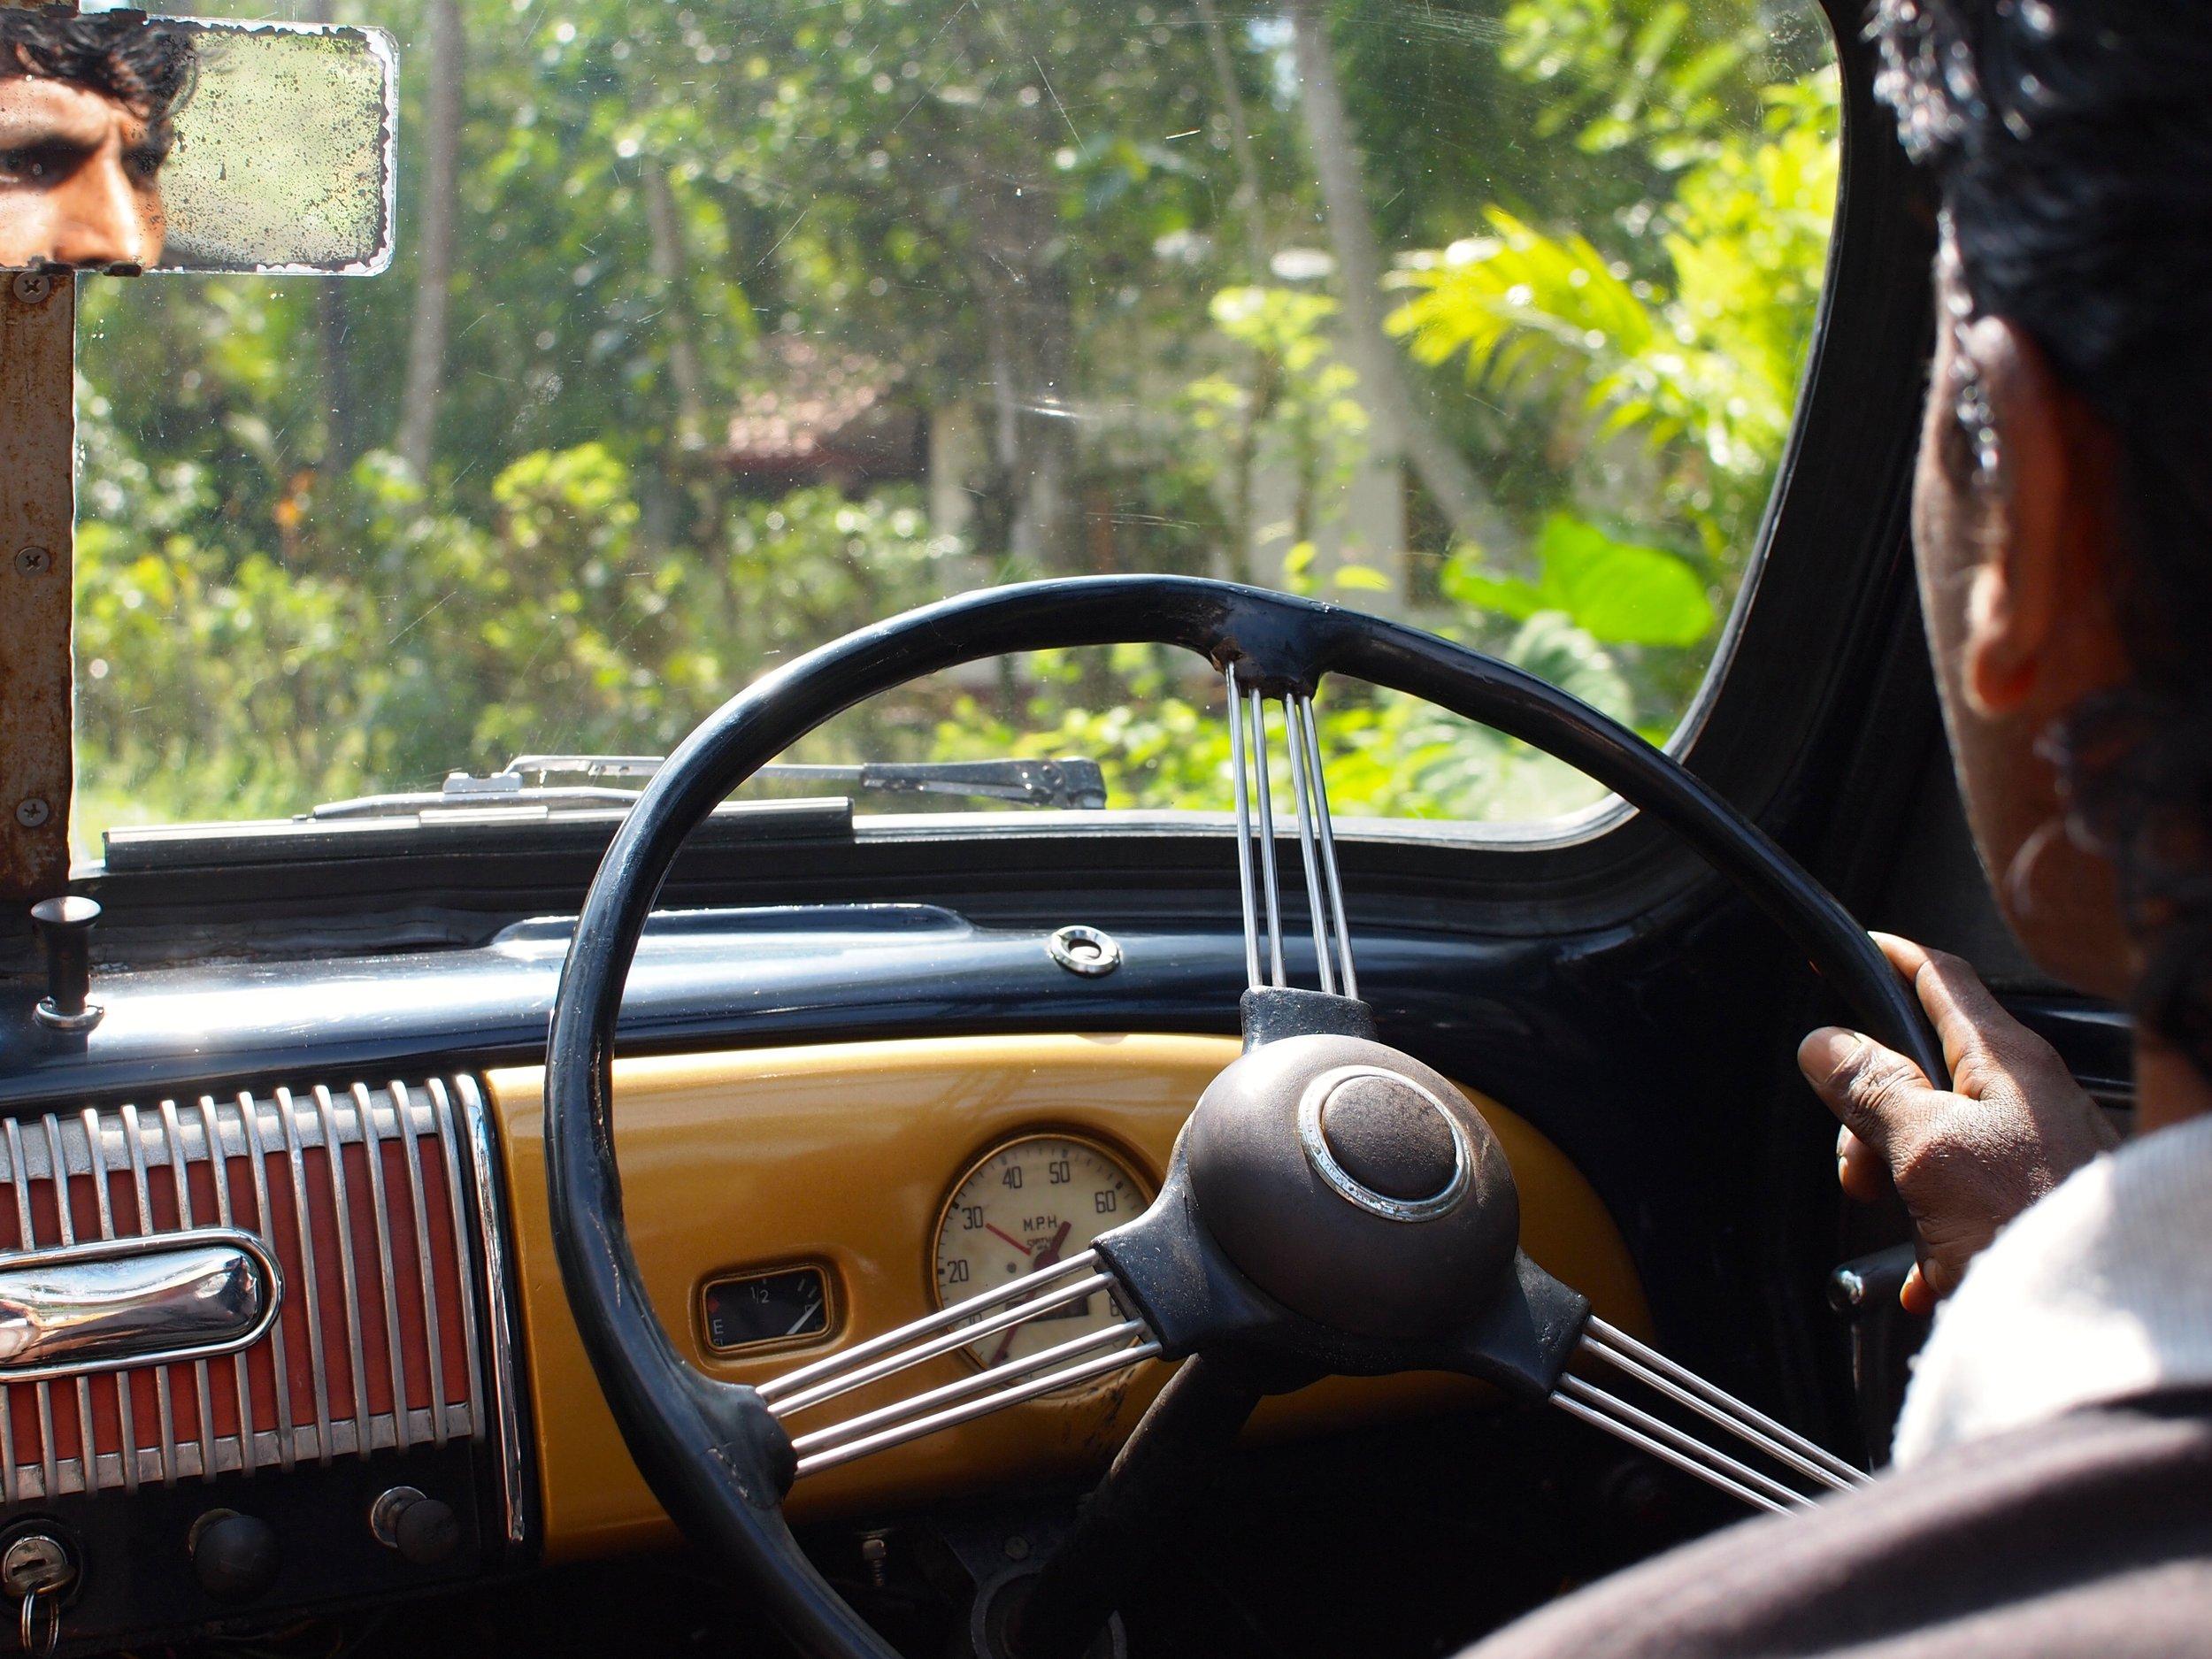 The drive to Lunuganga, Sri Lanka (image by Jacqui Gibson).